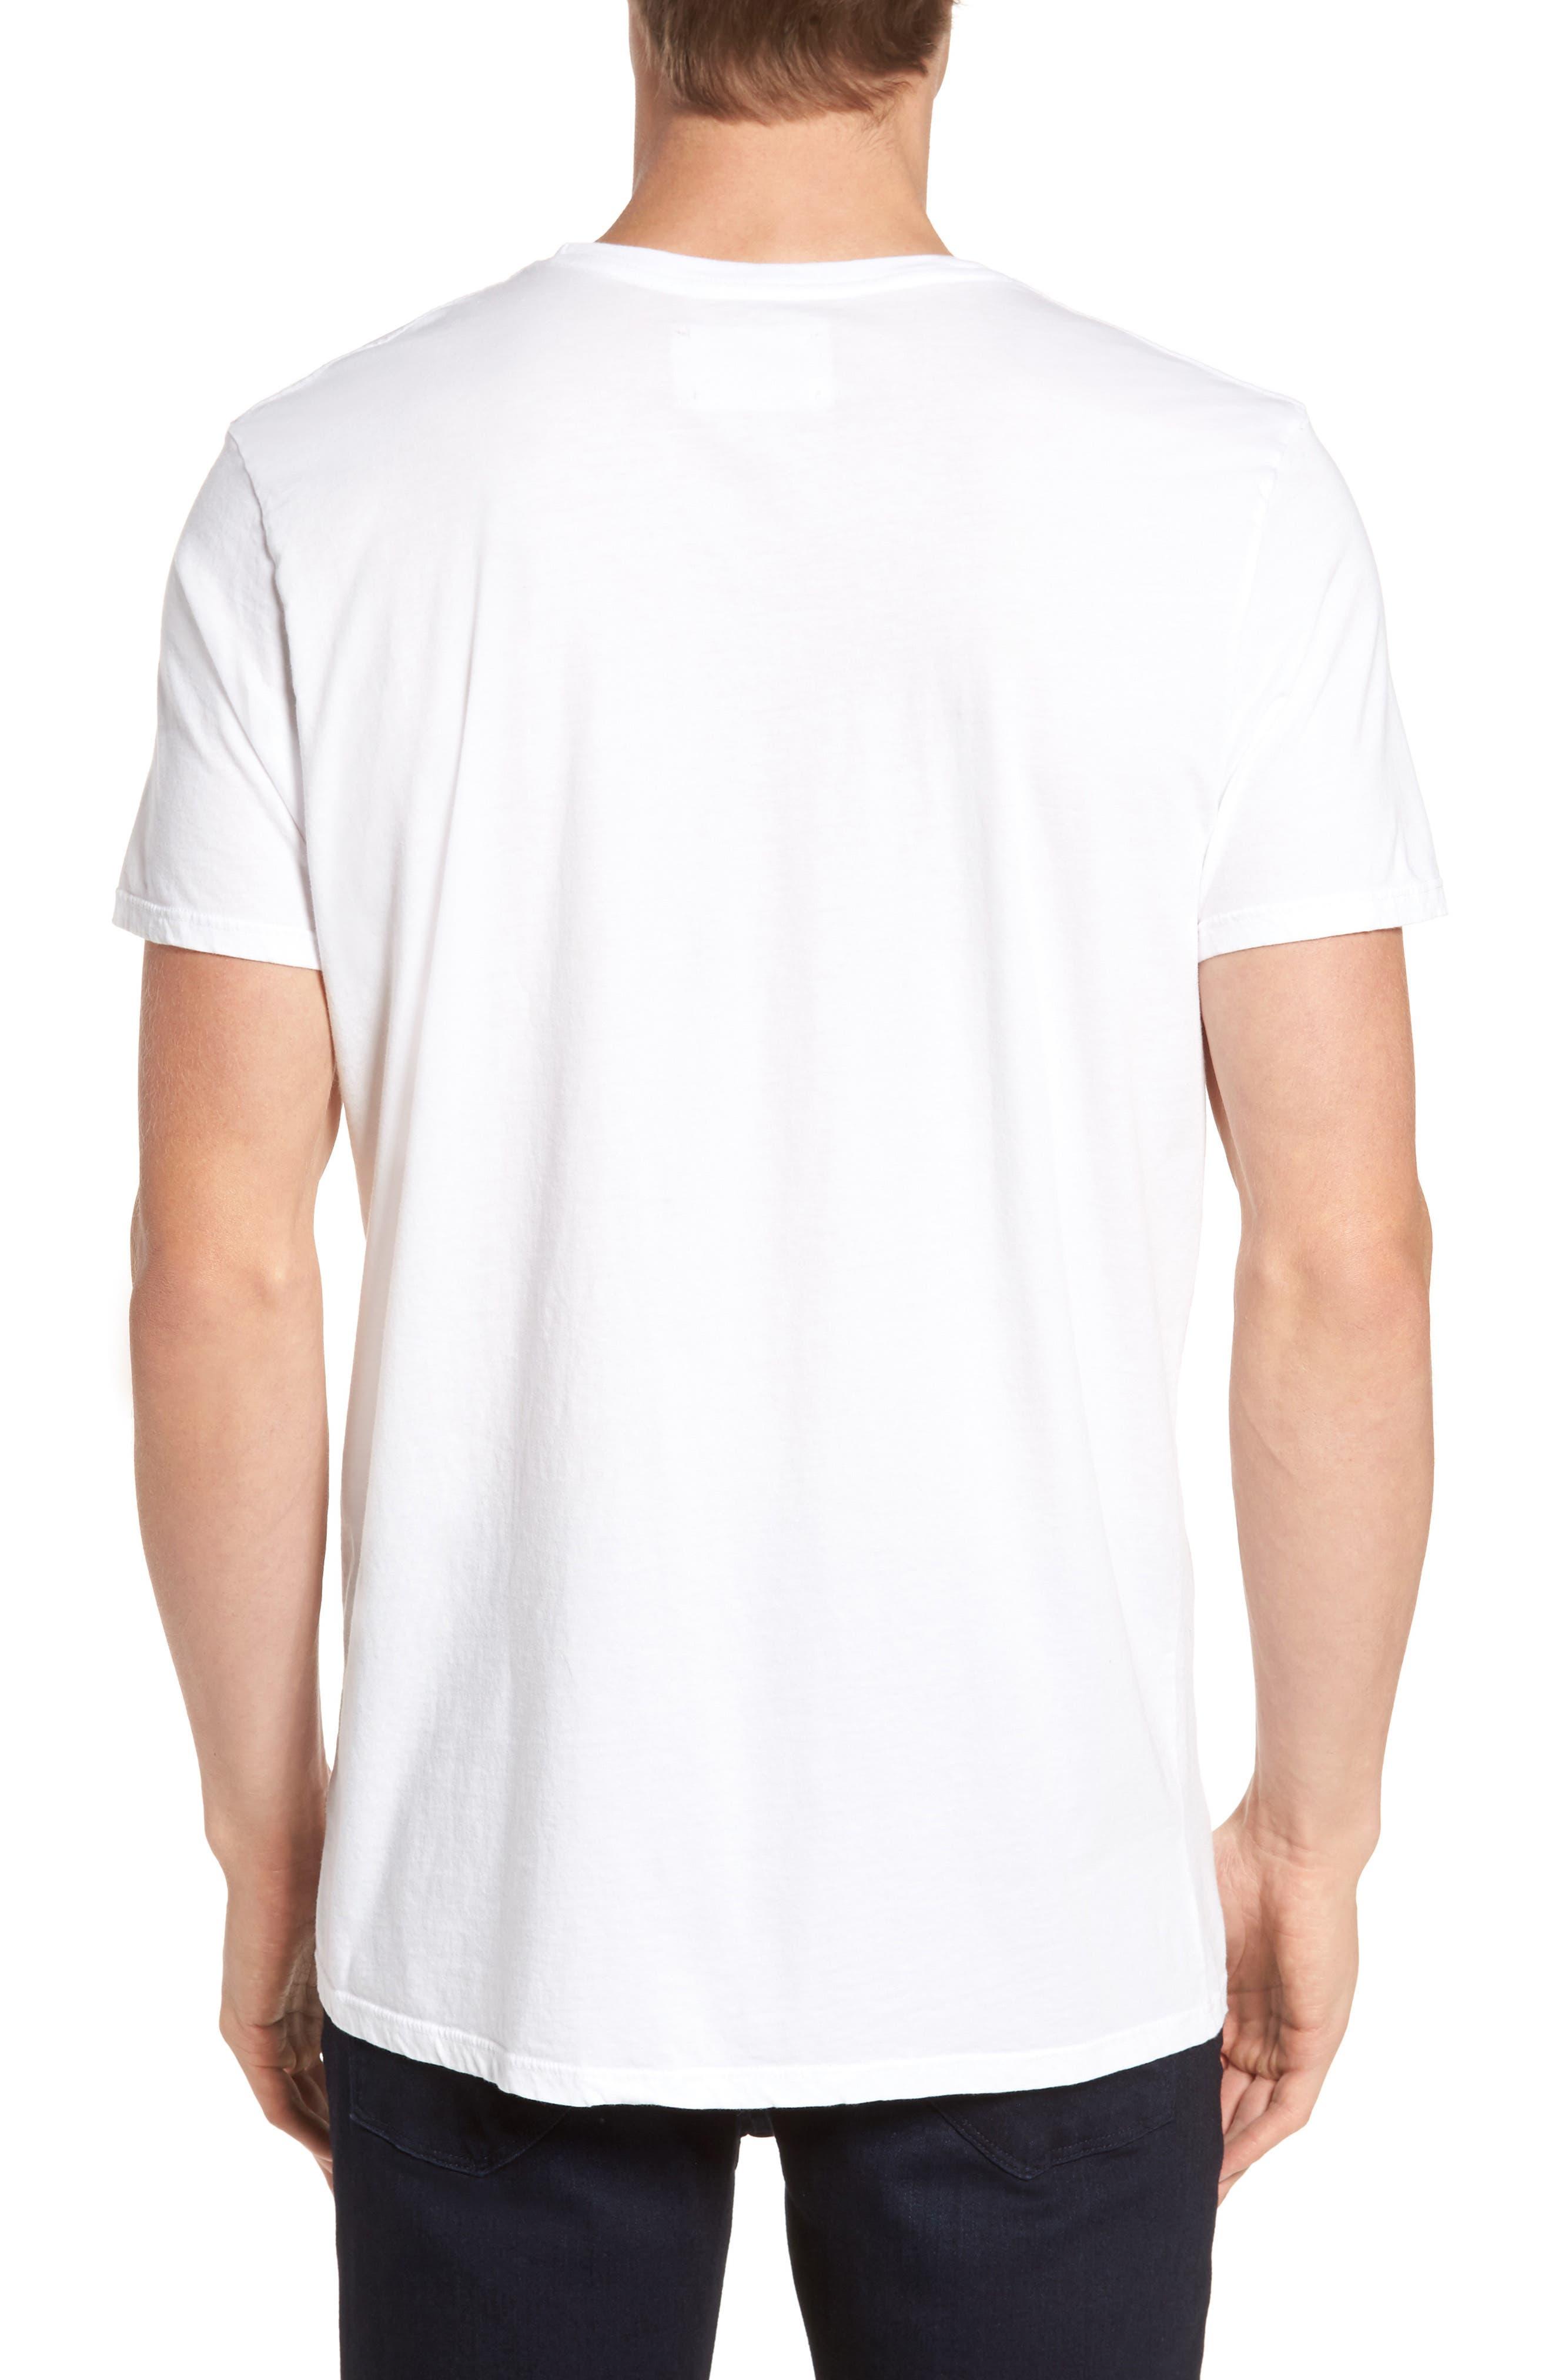 Western Sun T-Shirt,                             Alternate thumbnail 2, color,                             100